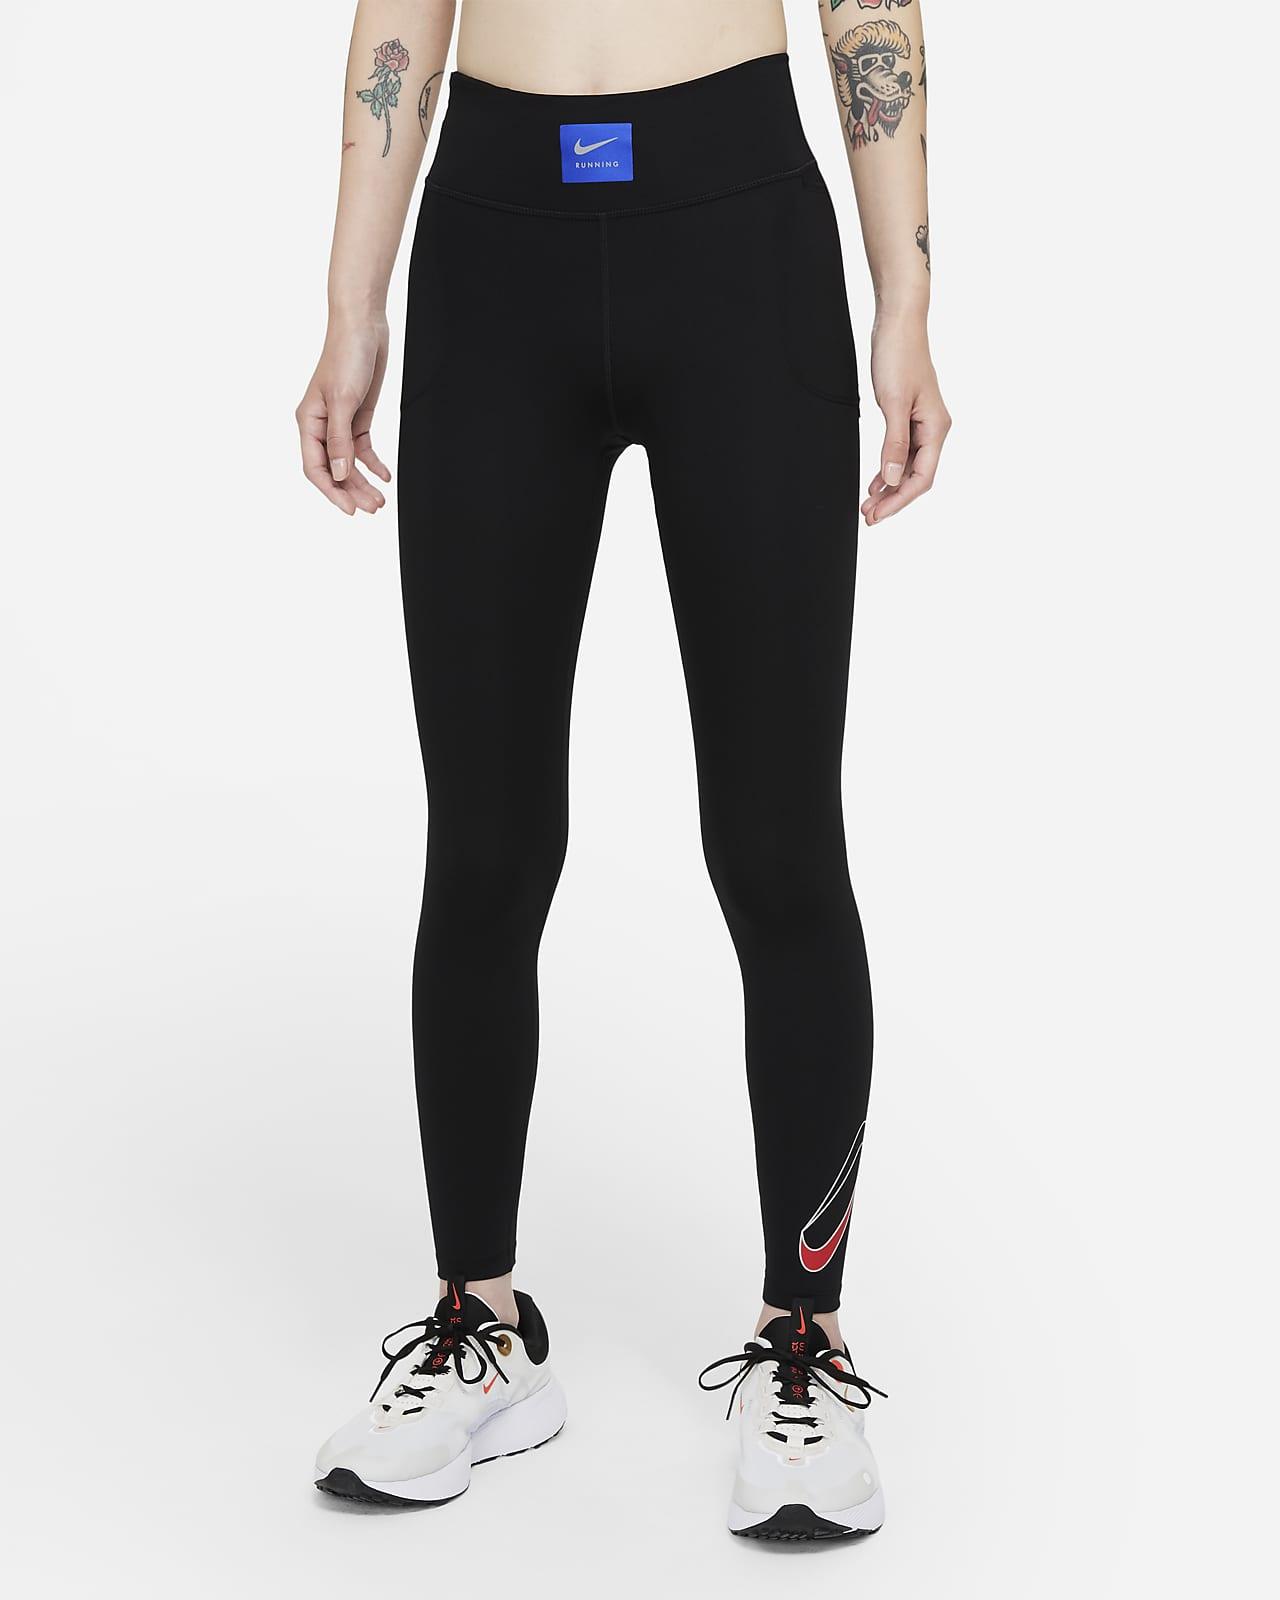 Nike Dri-FIT Retro Run Faster 女款中腰跑步九分內搭褲